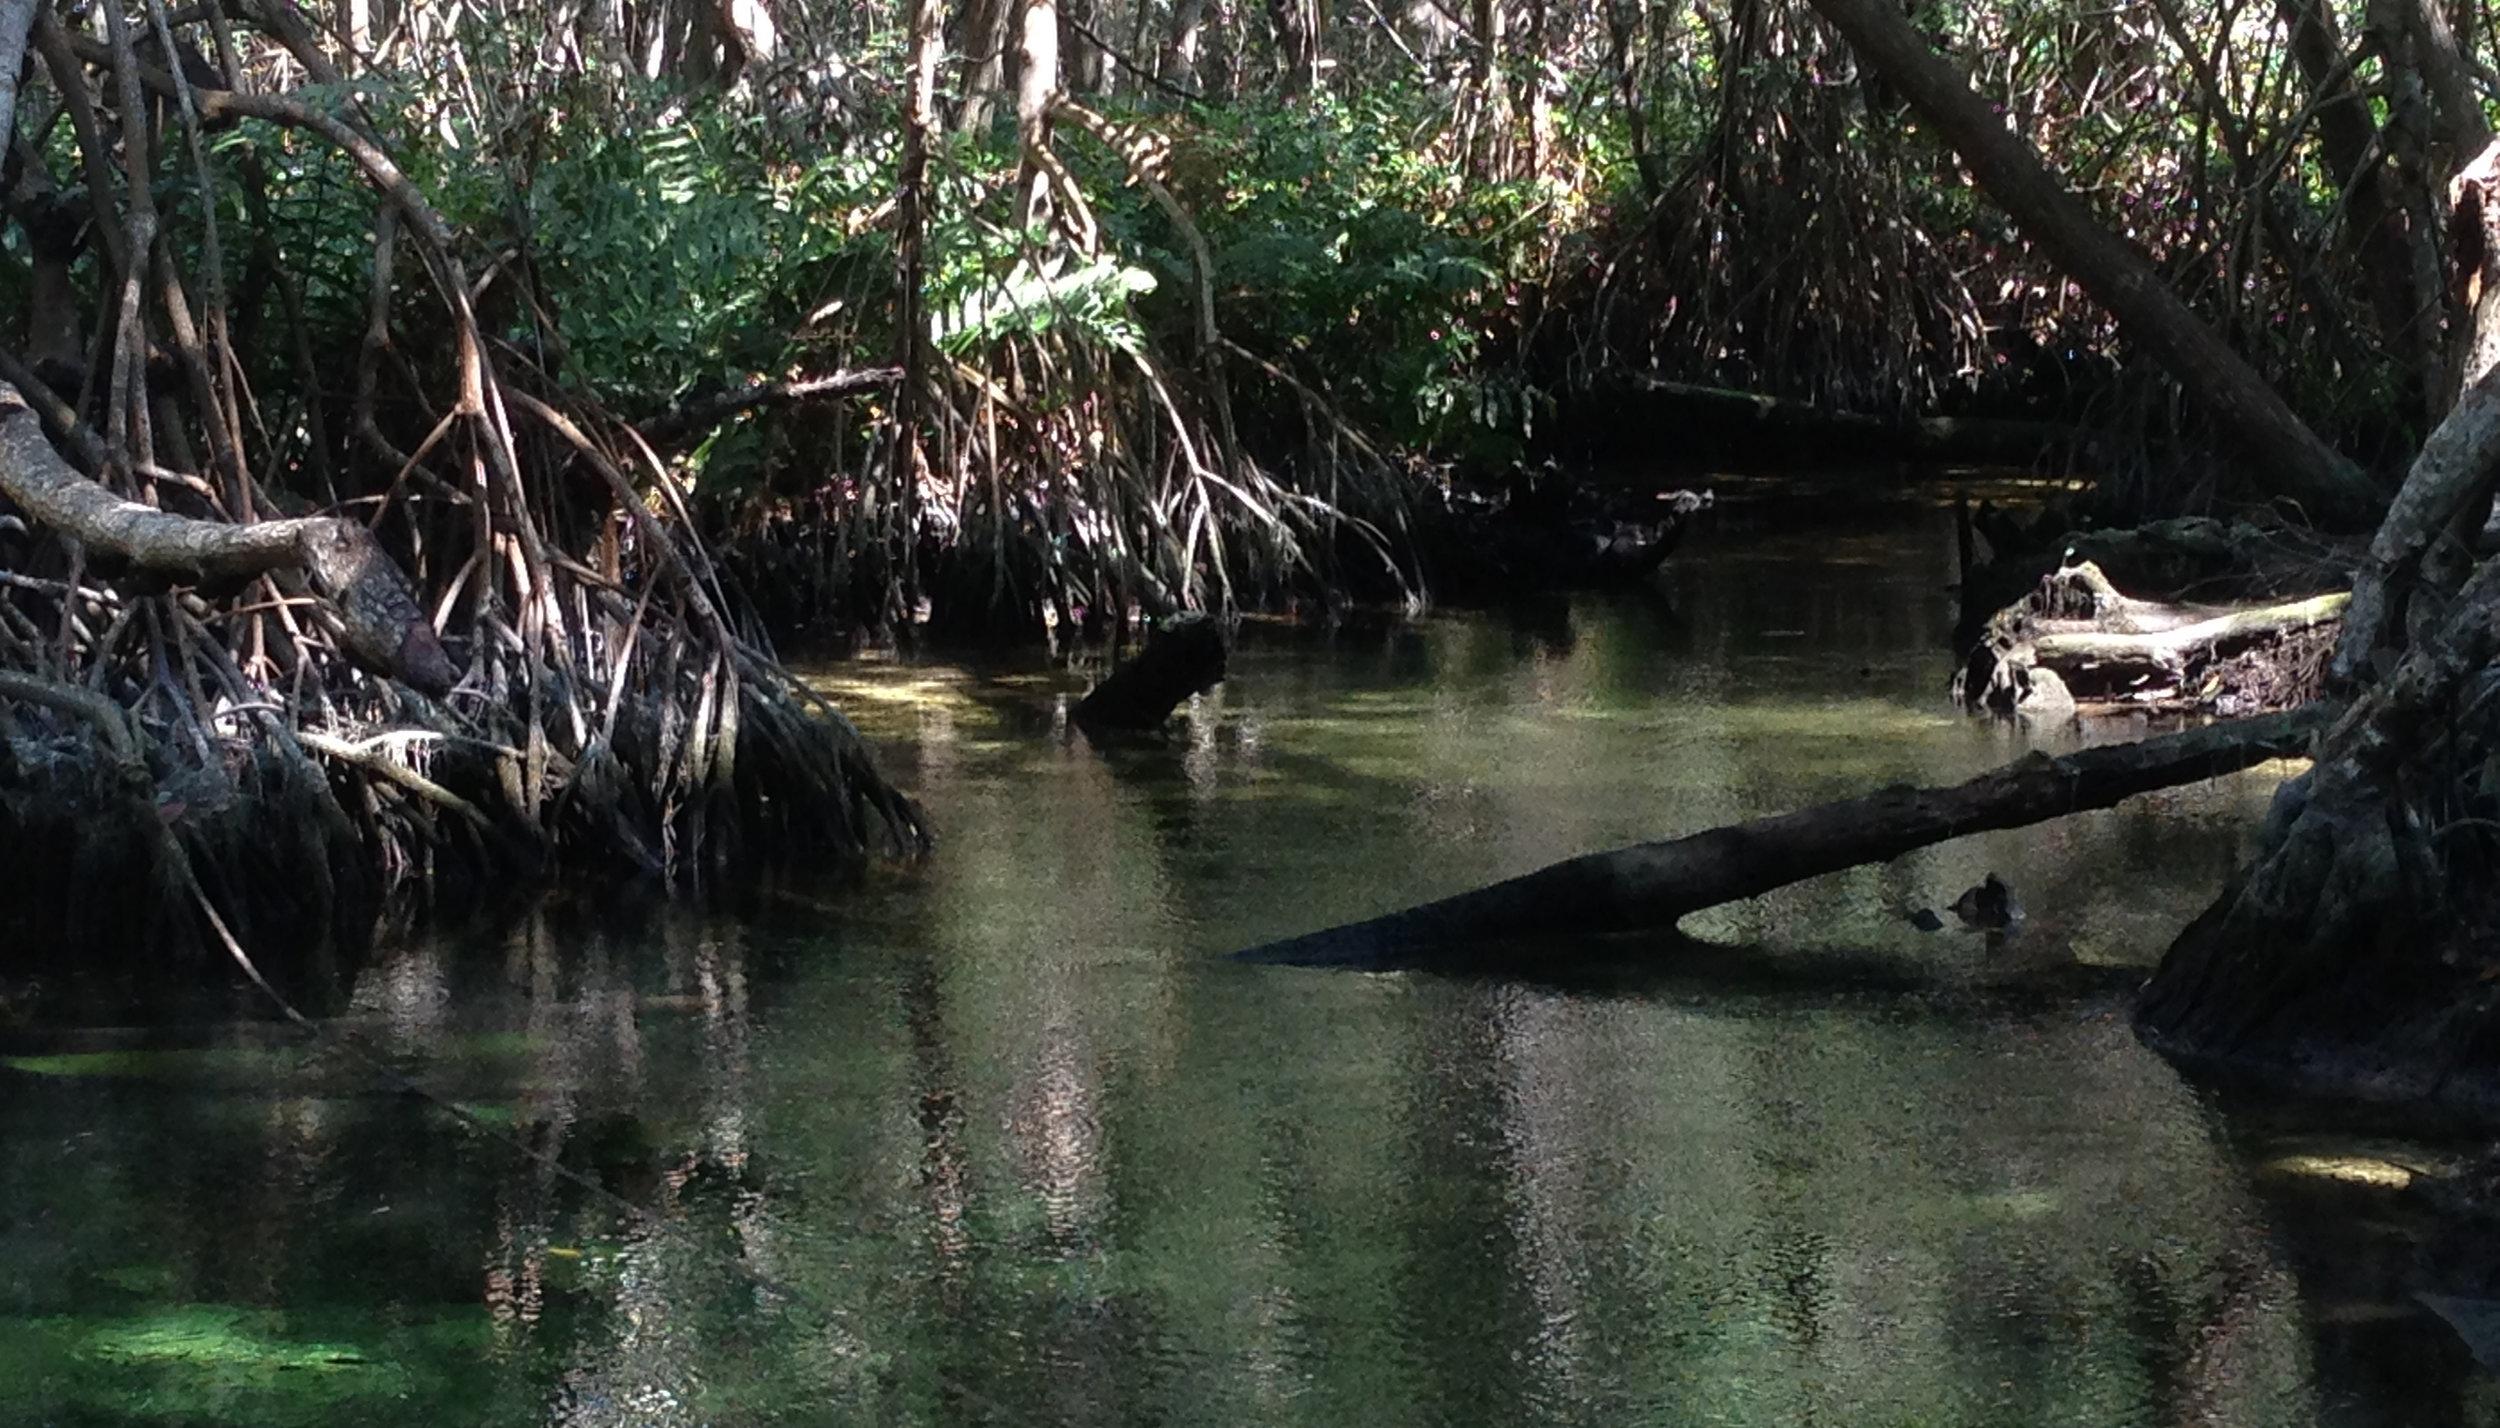 swamp_sm-1.jpg